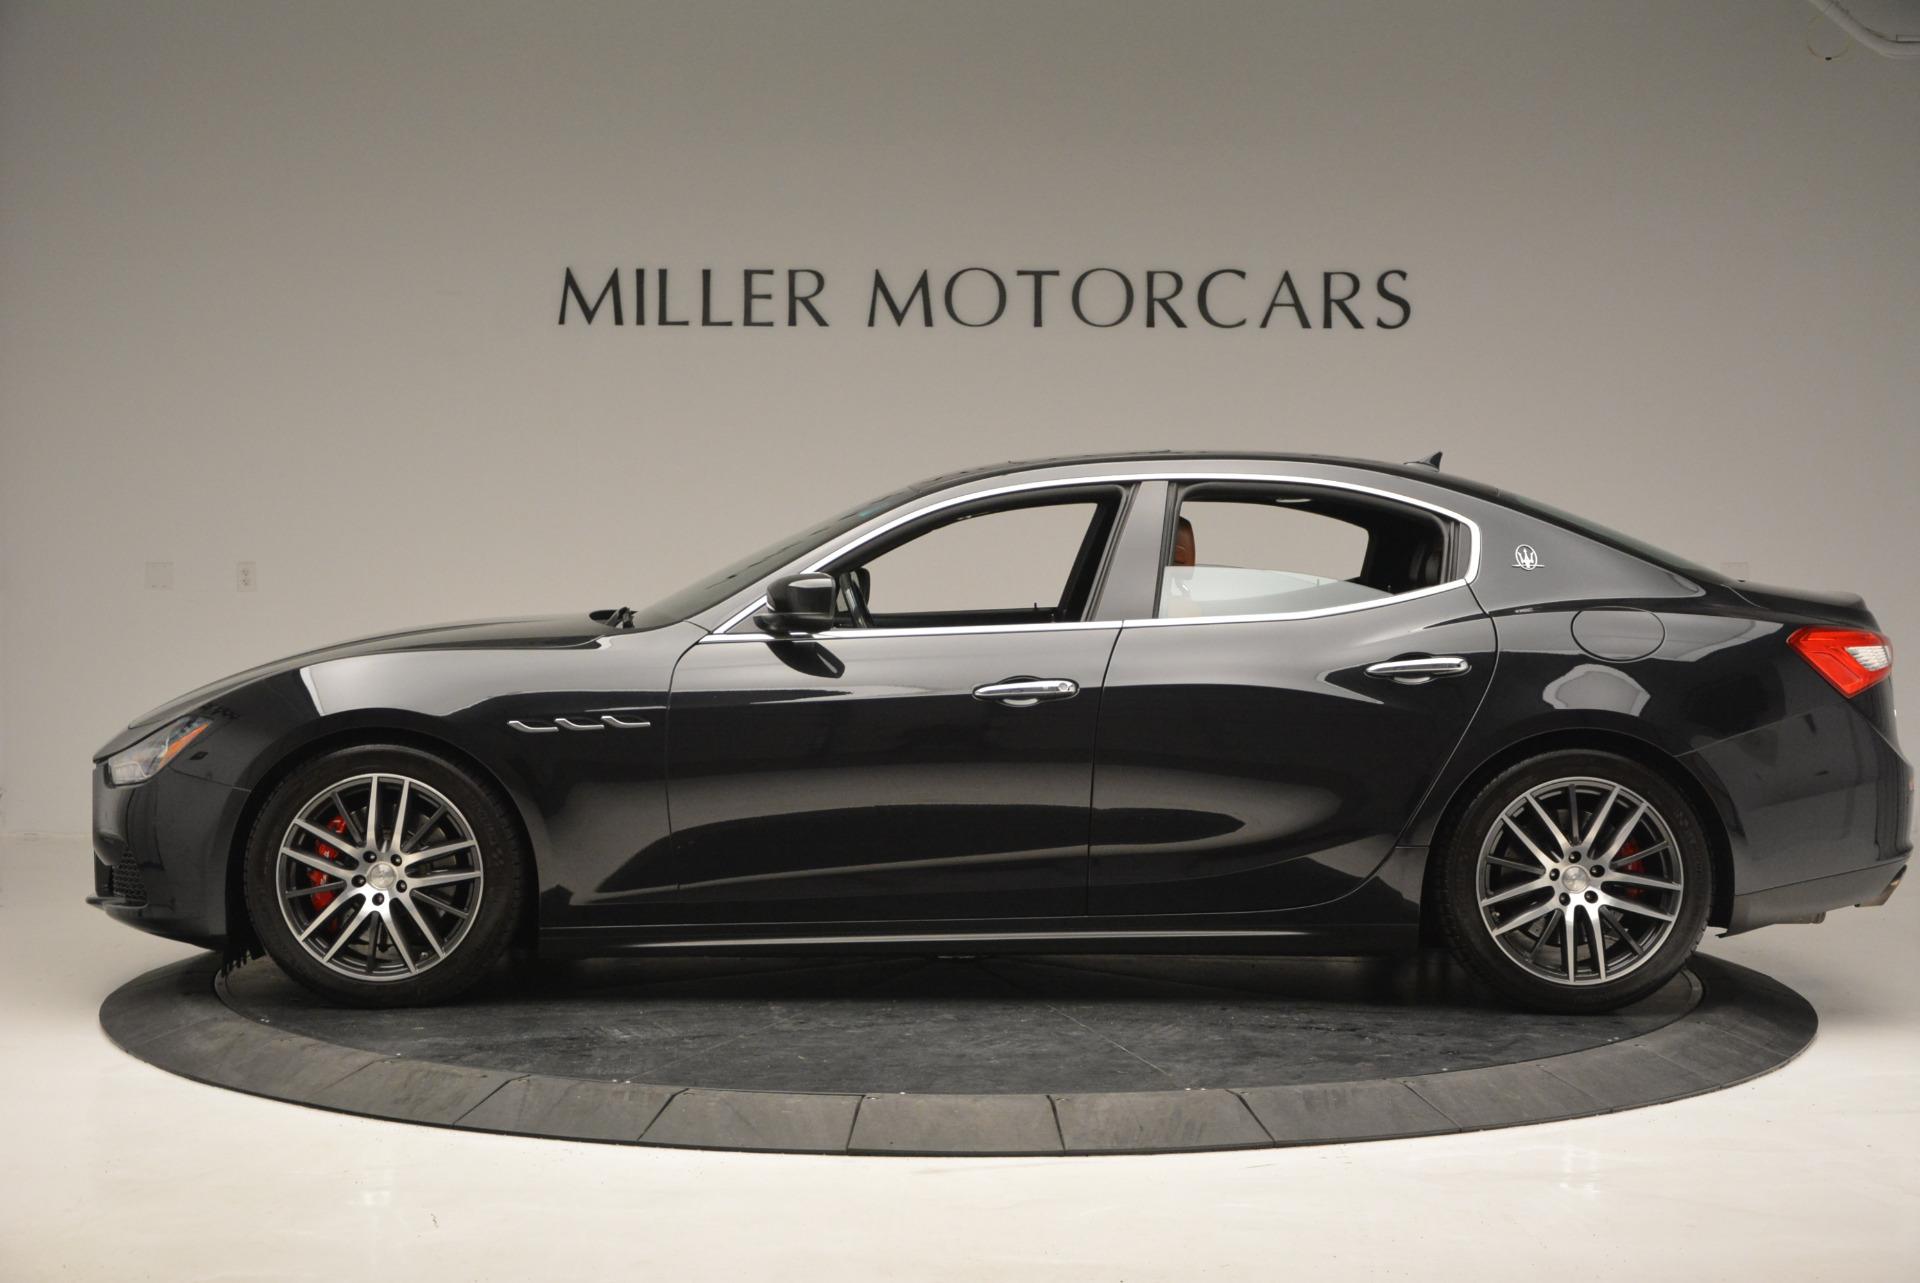 Used 2014 Maserati Ghibli S Q4 For Sale In Westport, CT 805_p3